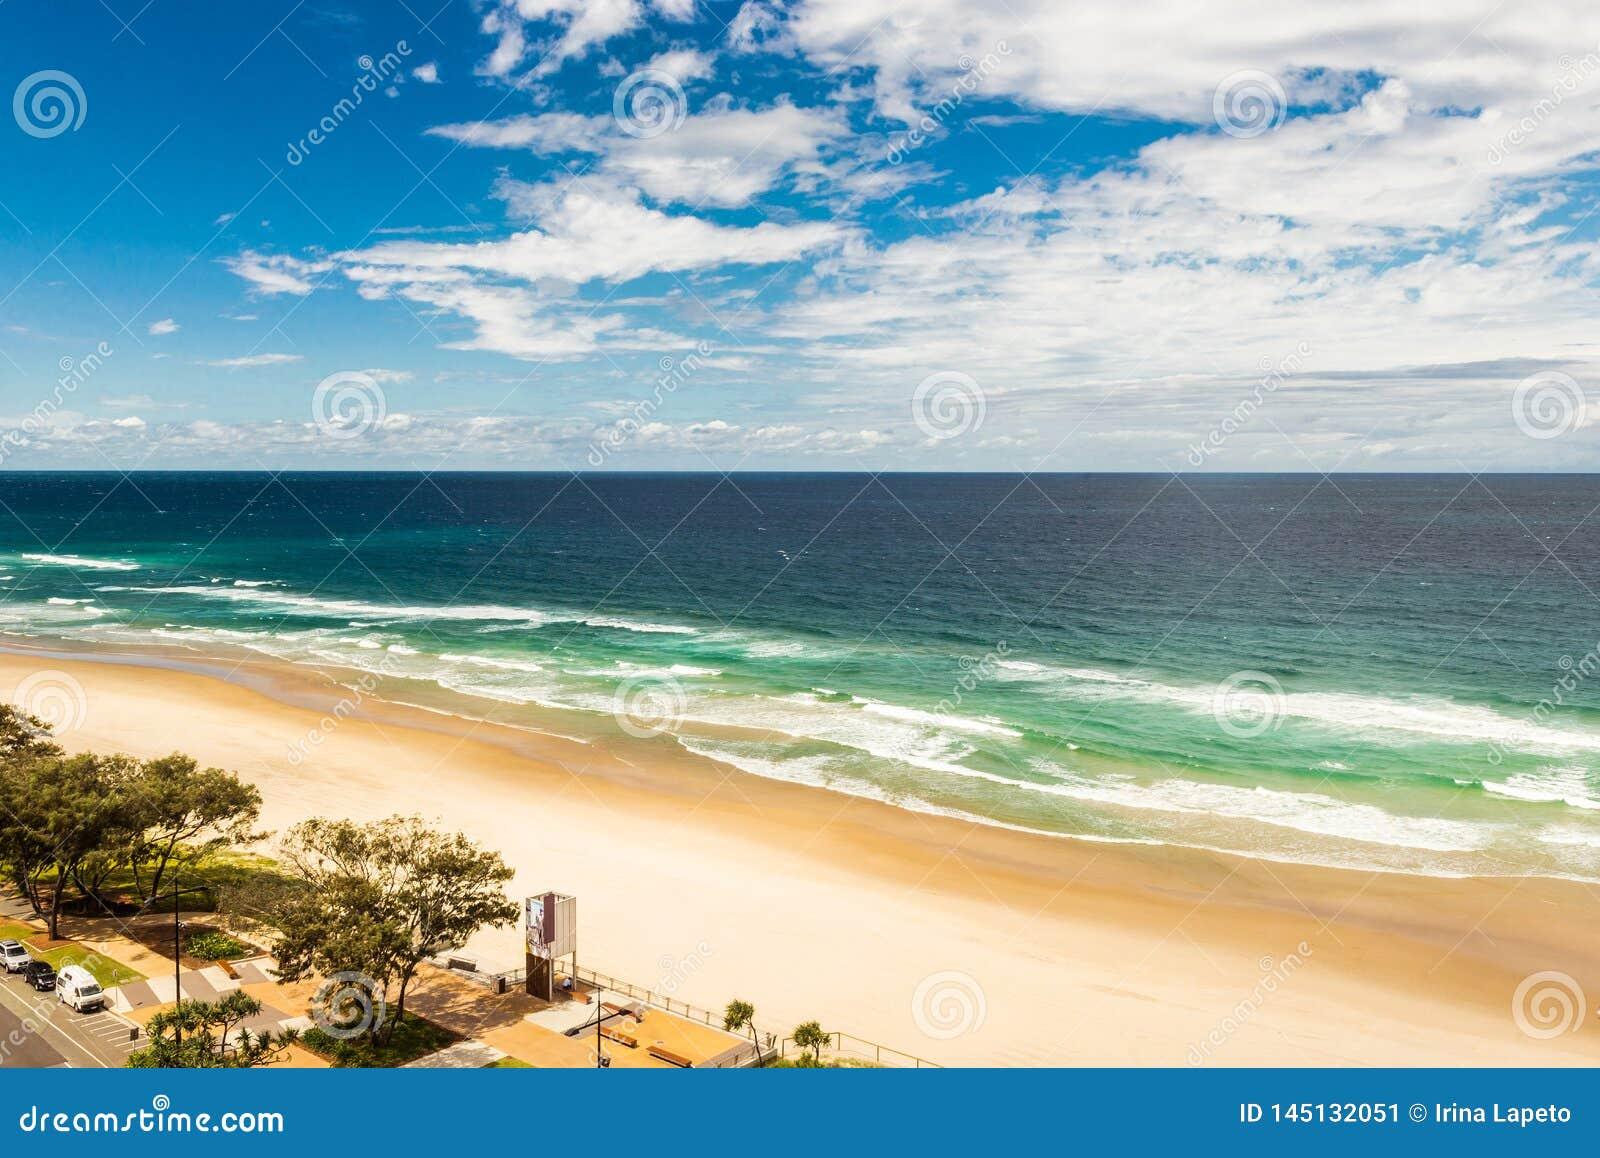 Landschaft des Meeres, blauer Himmel, sandiger Strand in Gold Coast Australien